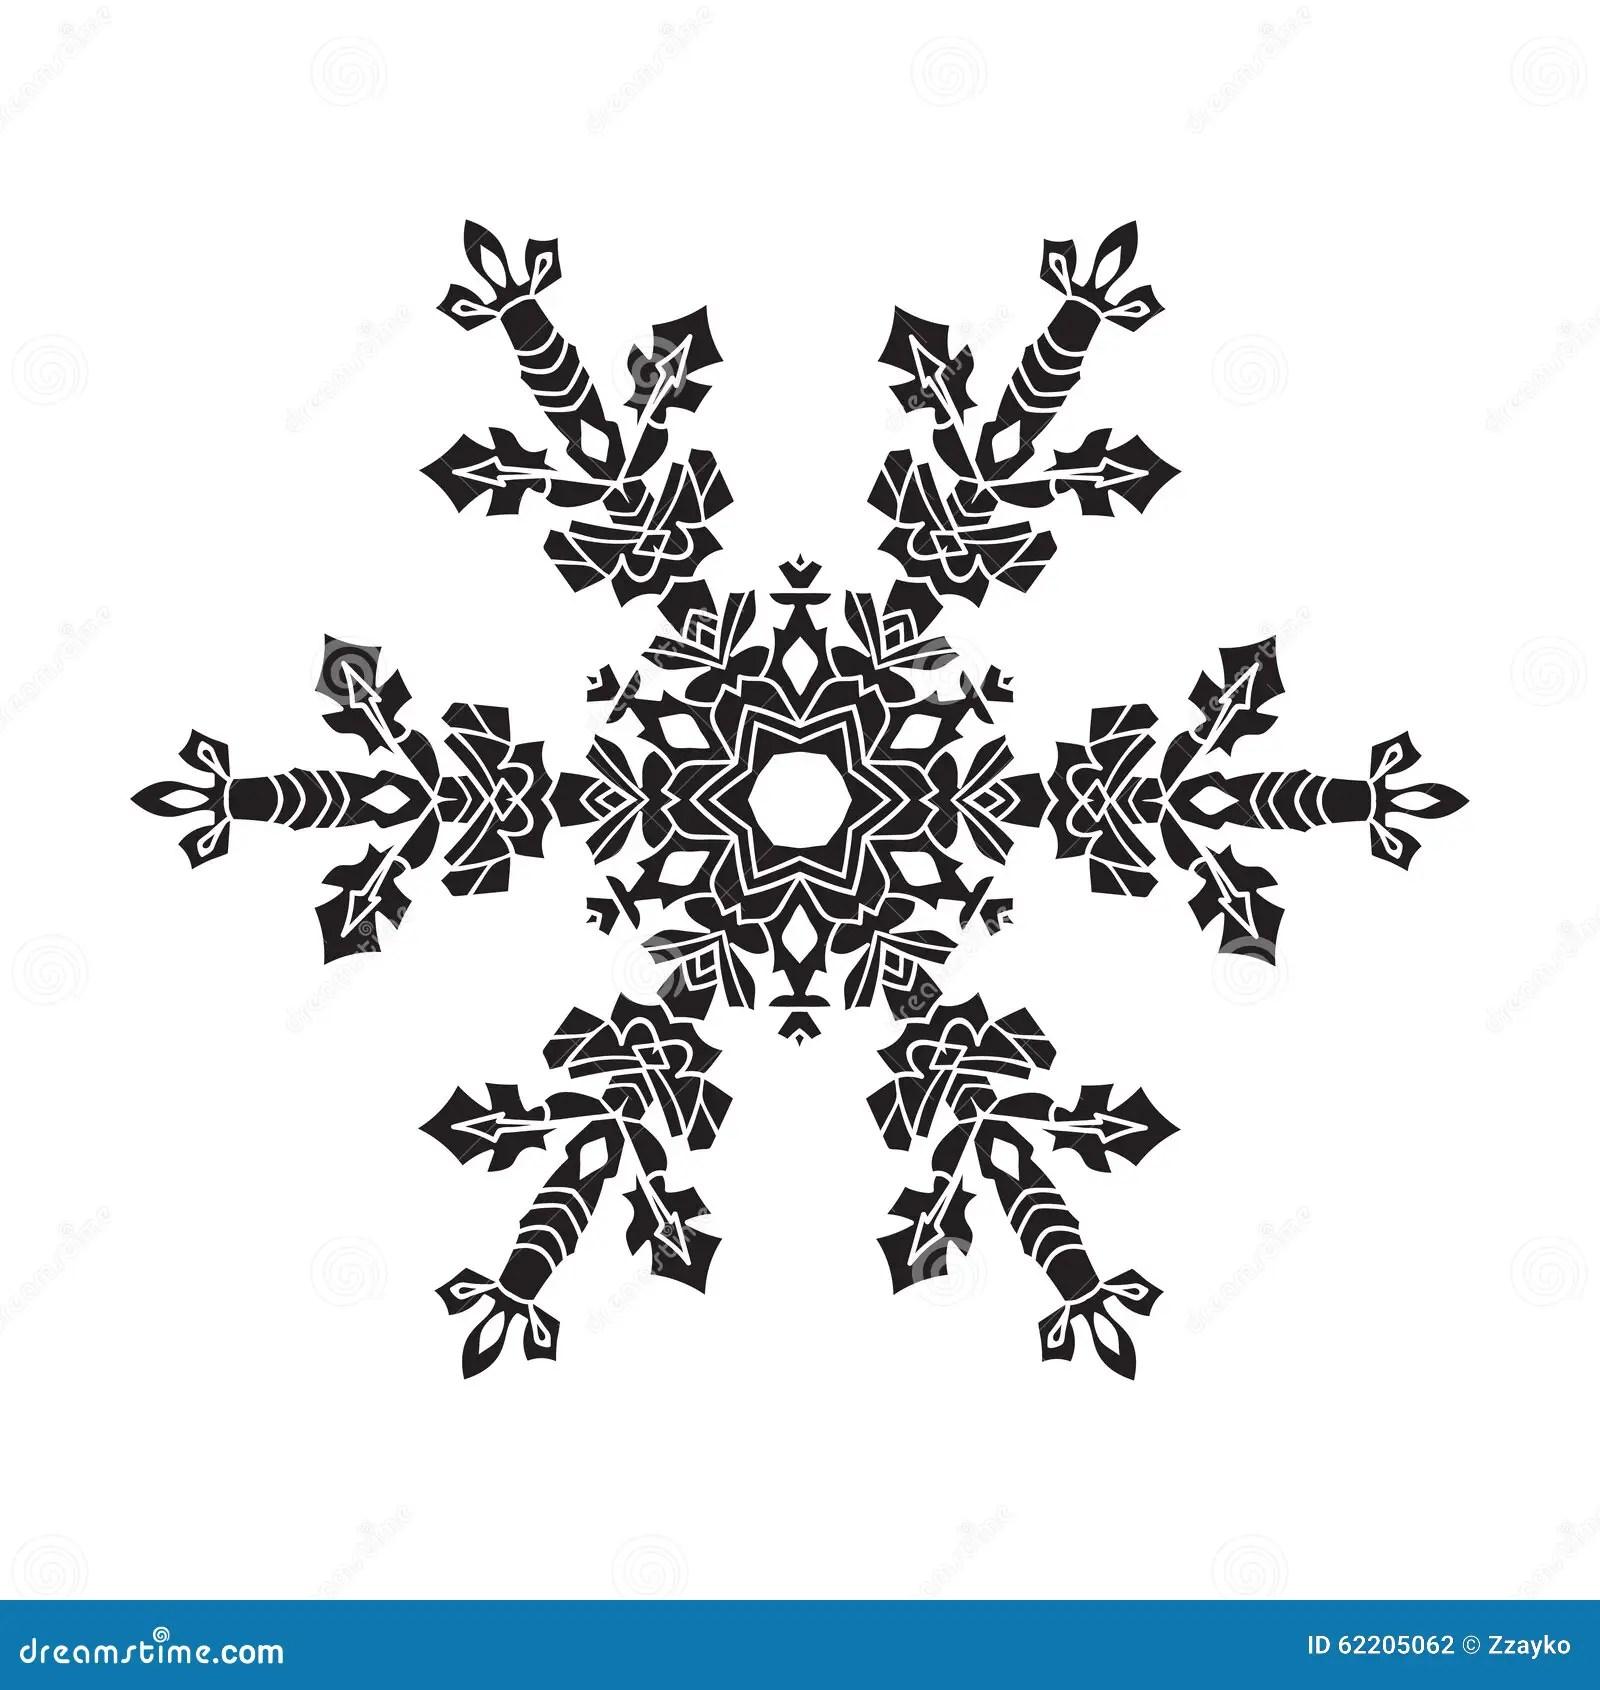 Hand Drawn Realistic Silhouette Snowflake Black On White